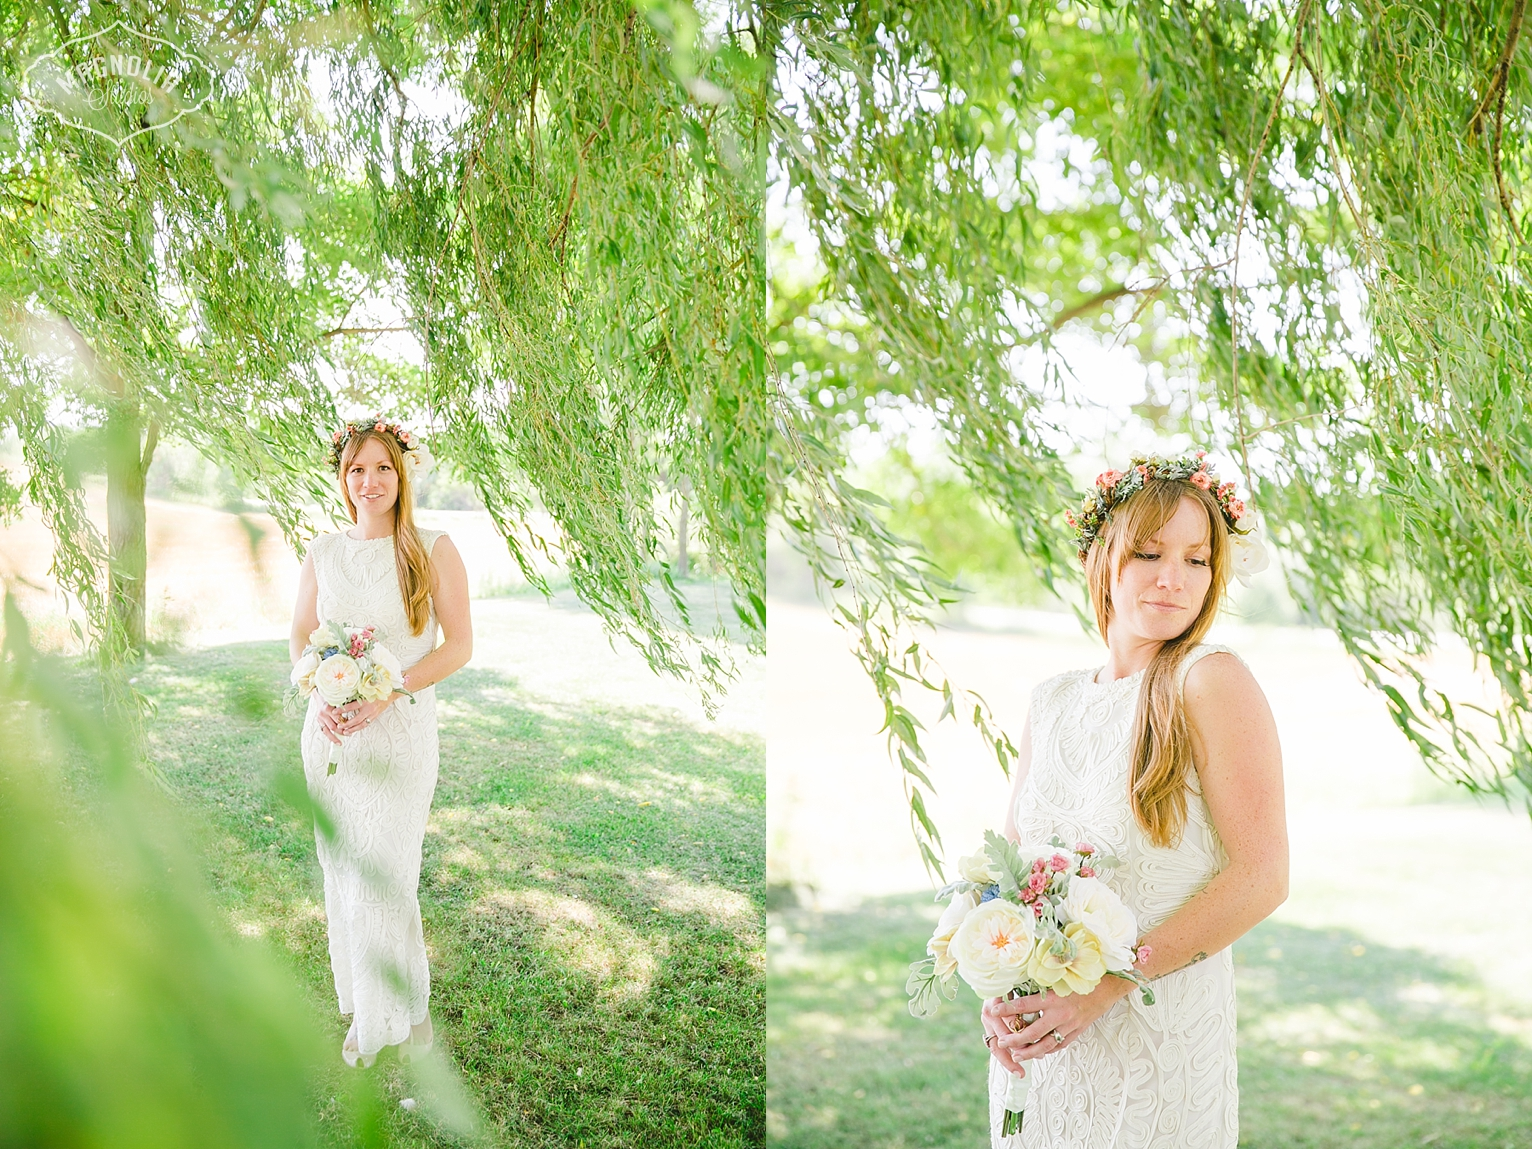 bohemian bride flower crown and crochet dress